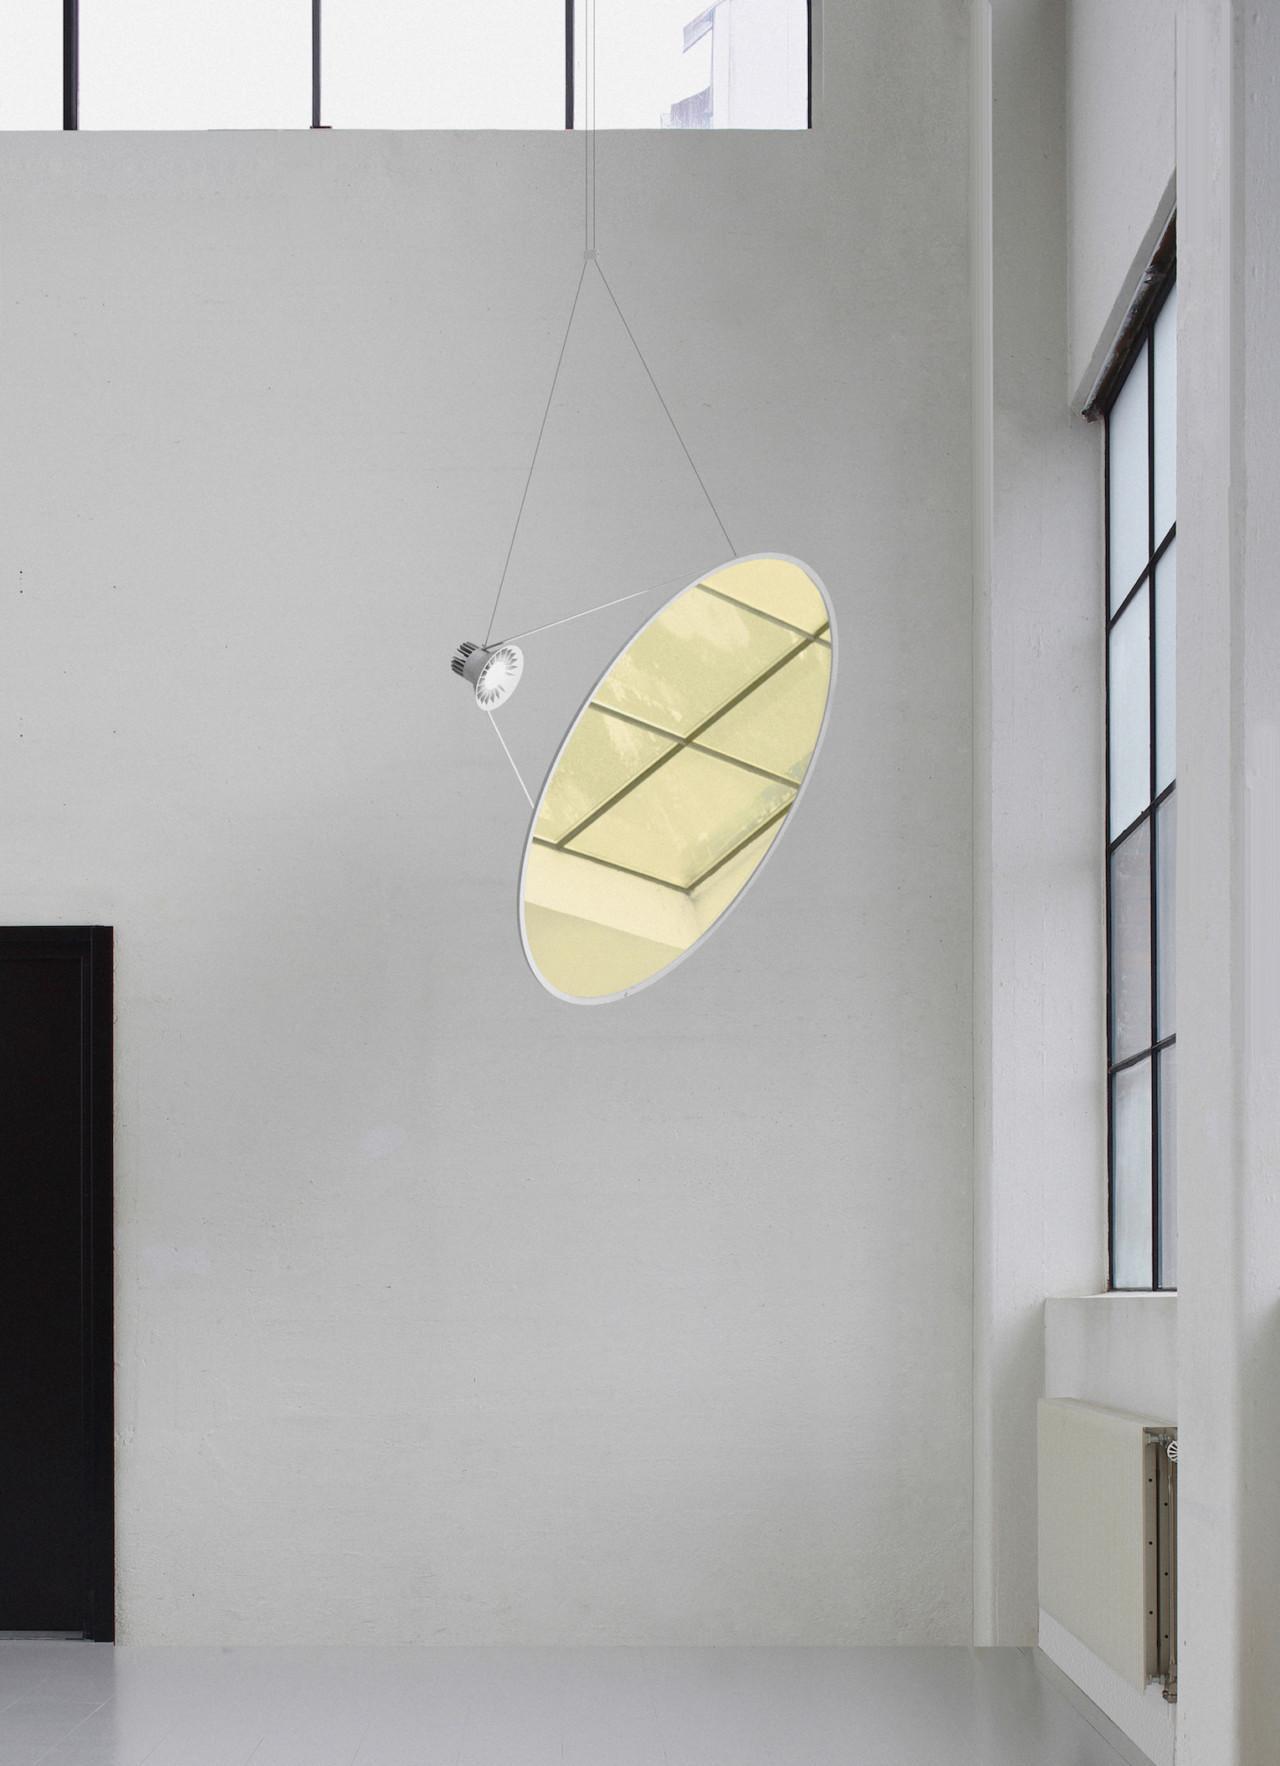 đèn treo amisol 2